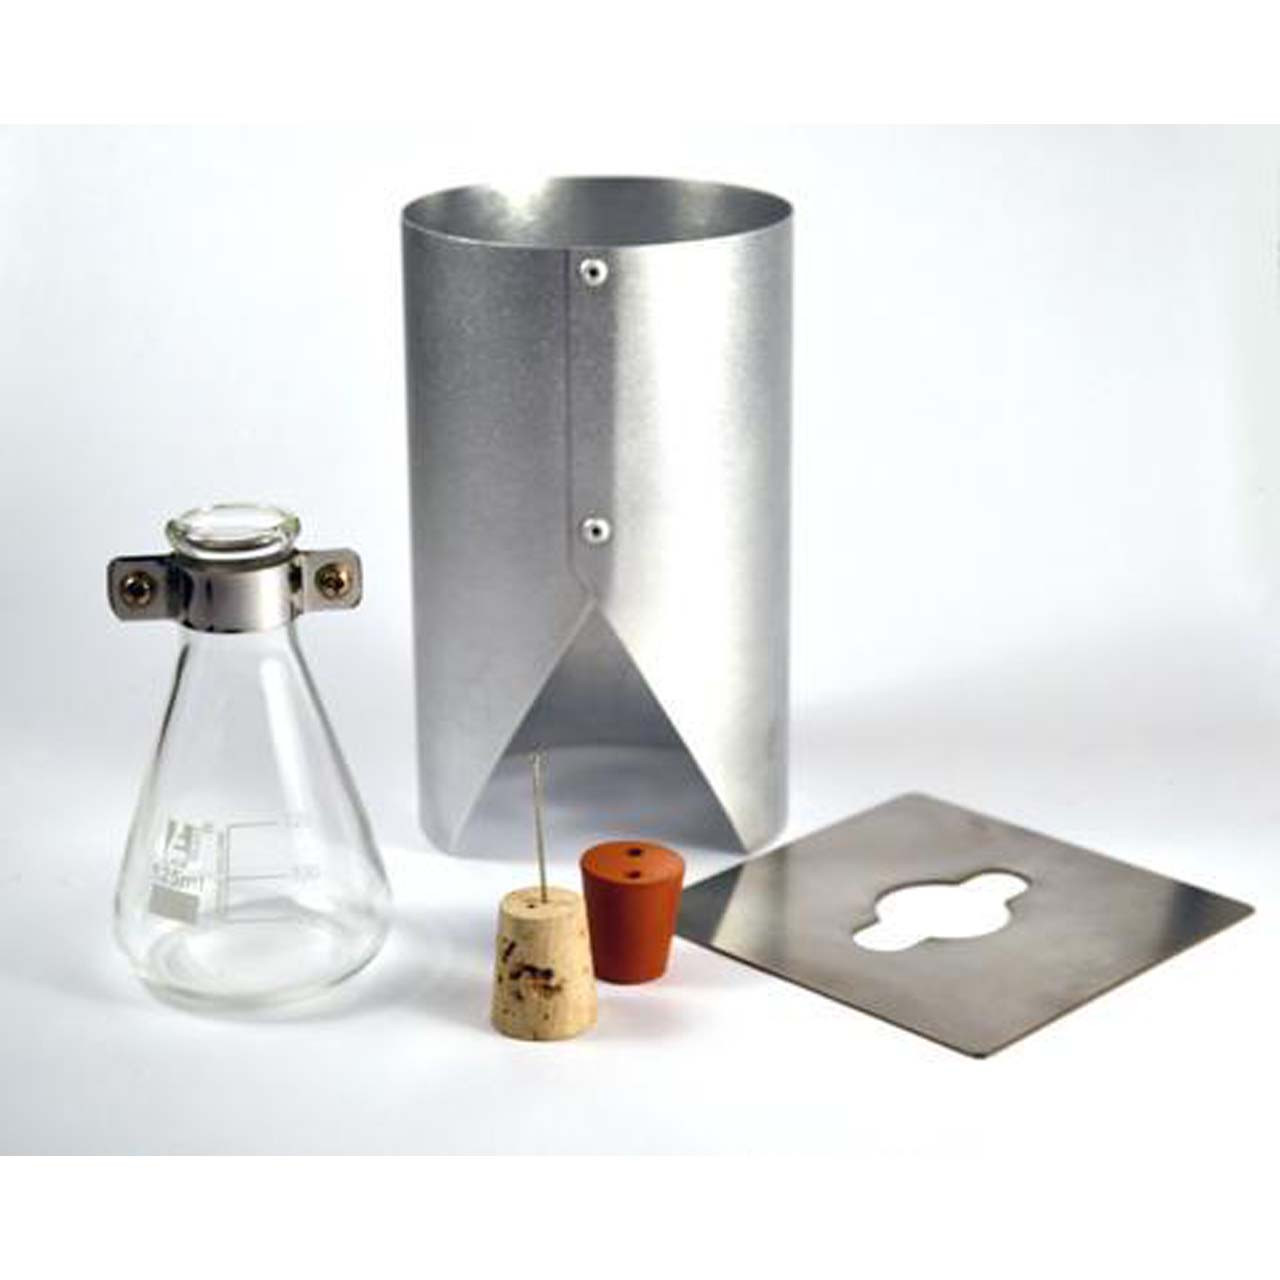 PY3.10 - Food calorimeter set